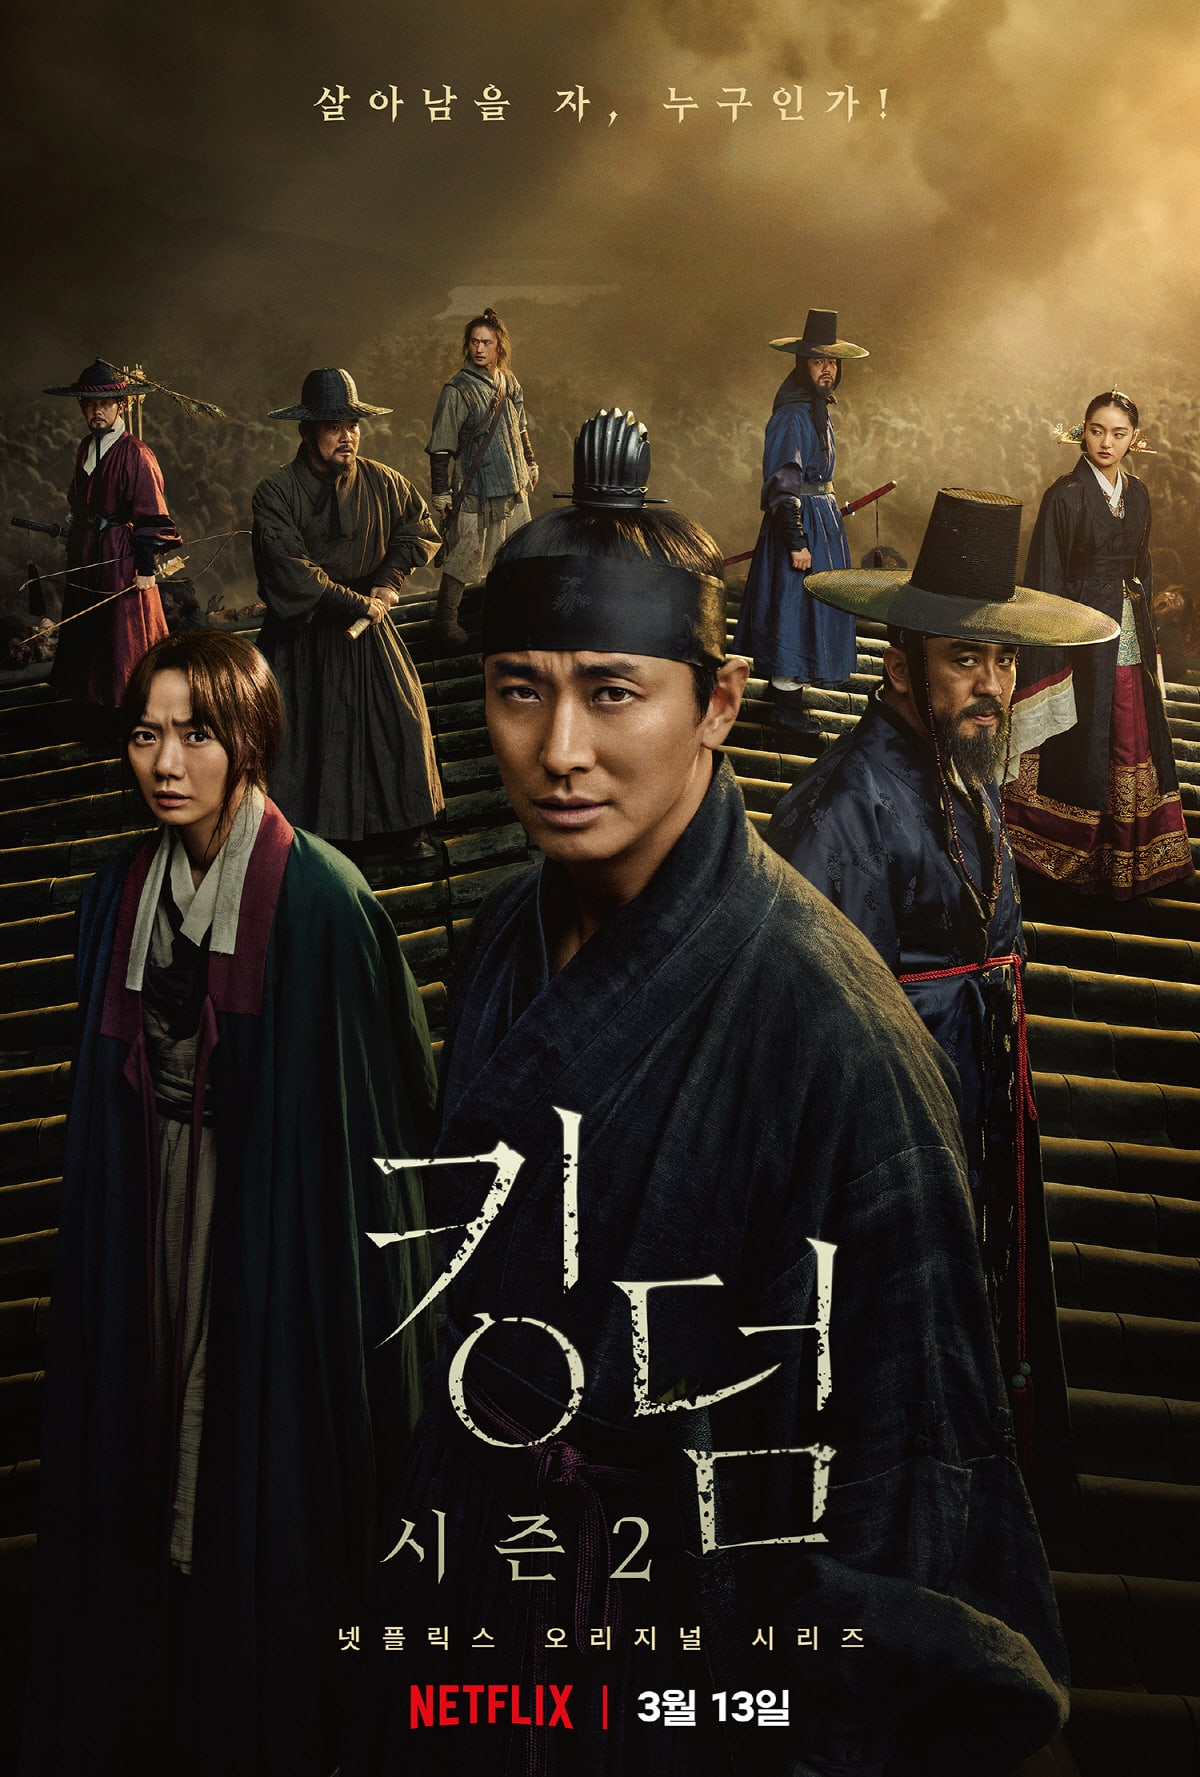 Kingdom Season 2 (2020) [COMPLETE]